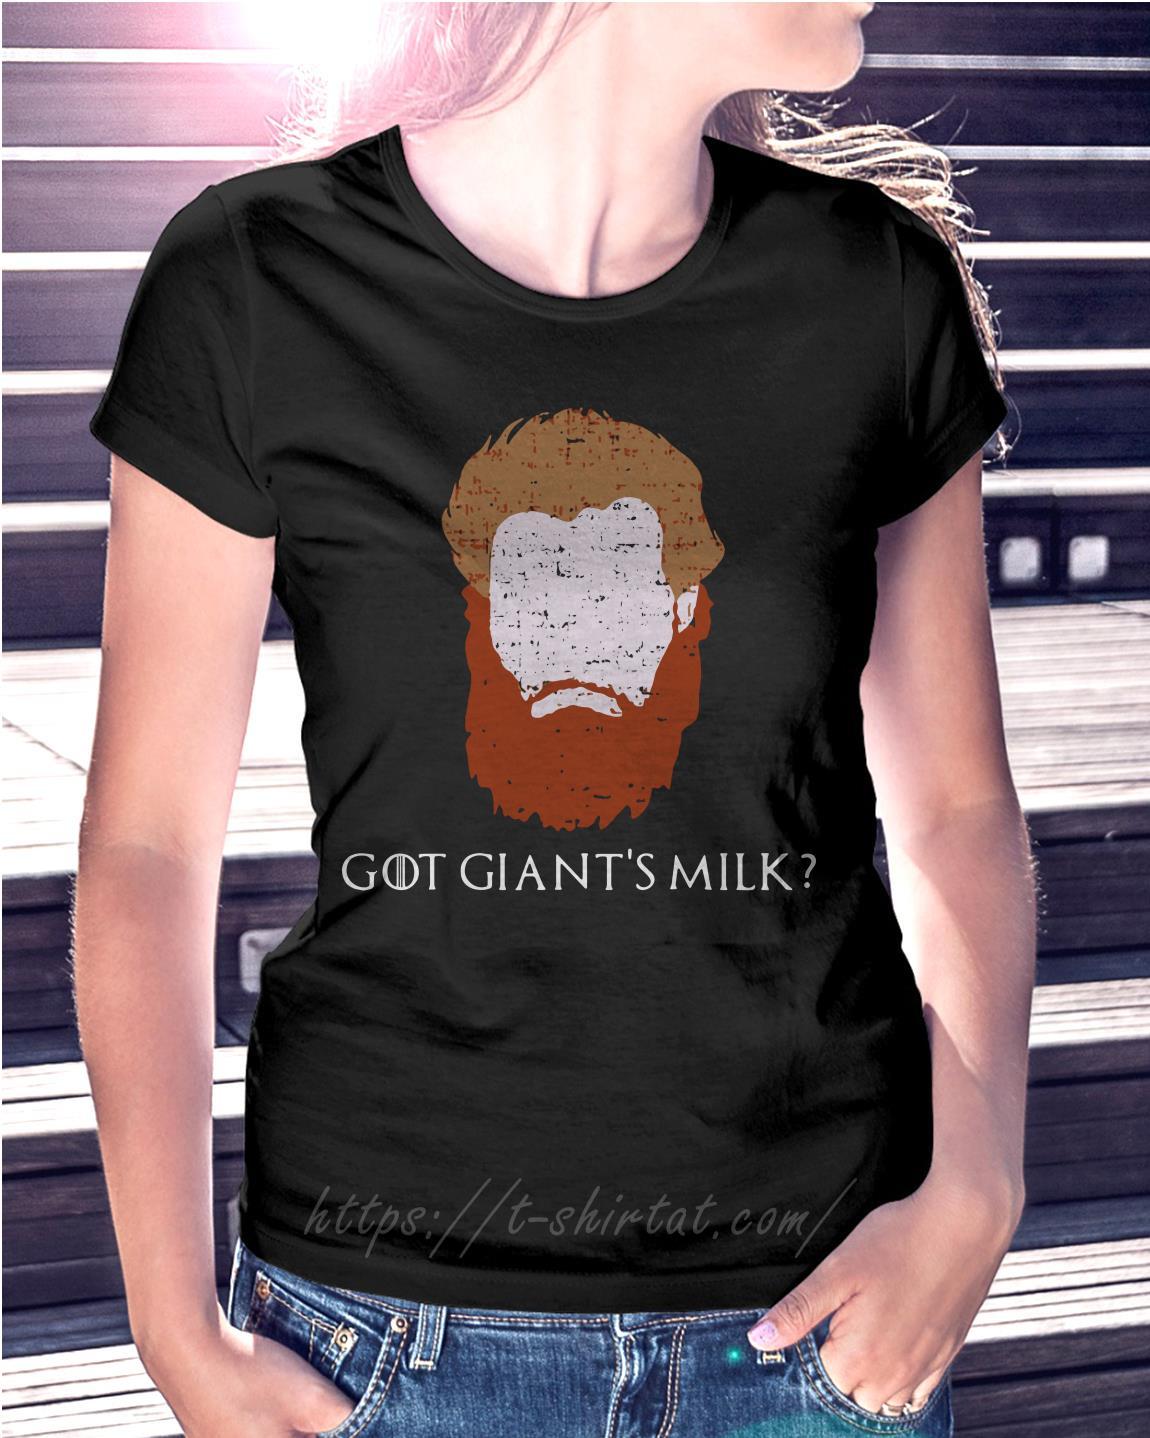 370a3b78a GOT giant's milk Tormund Giantsbane Game of Thrones shirt